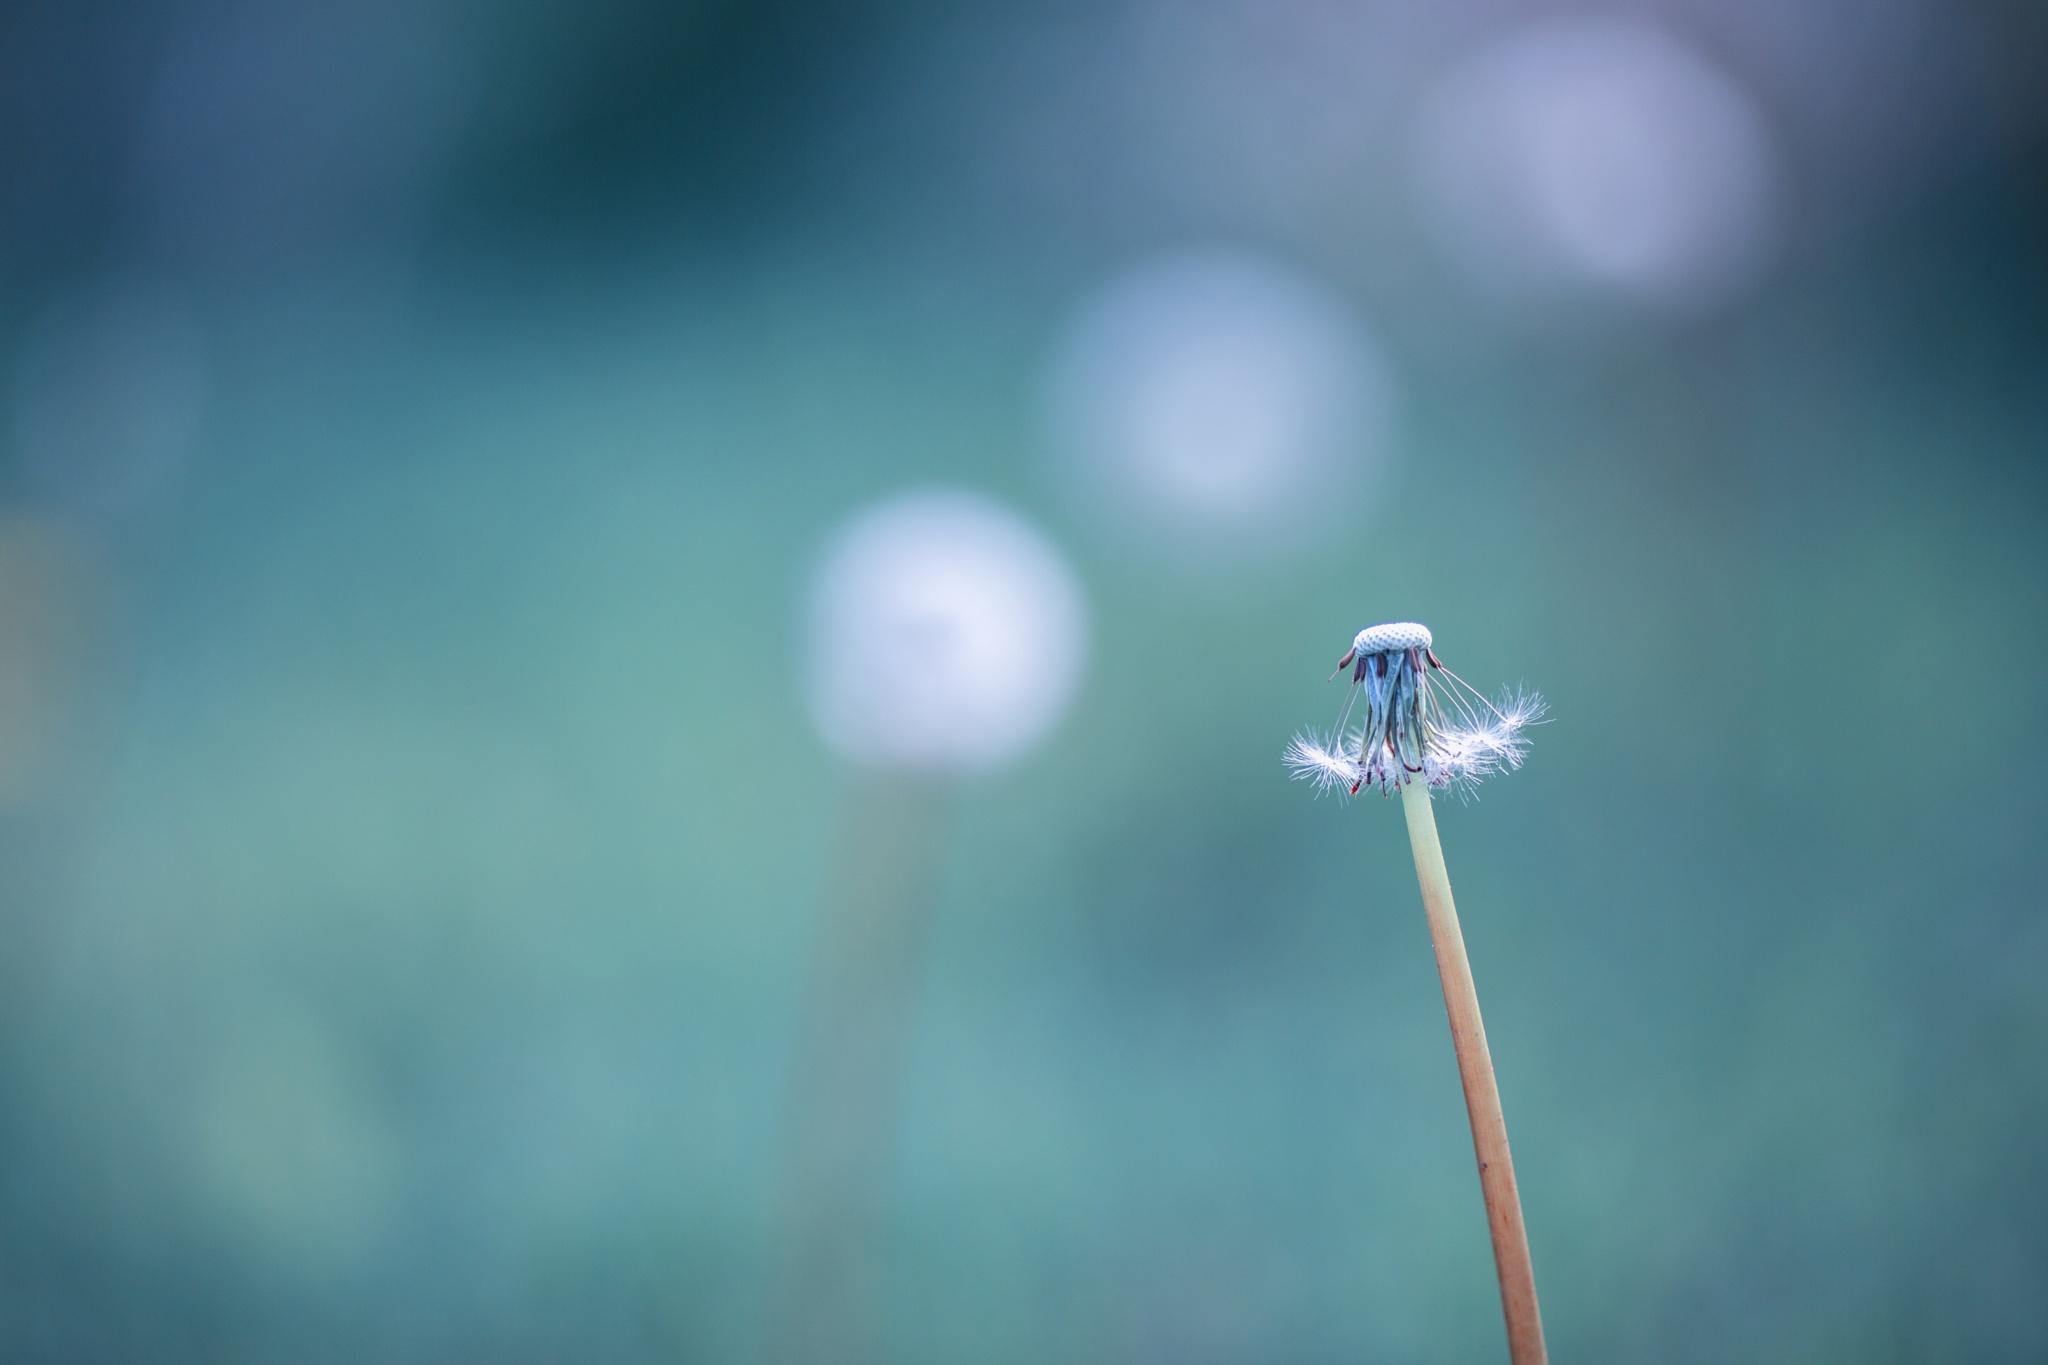 Summer Fairytale  by robertkuro